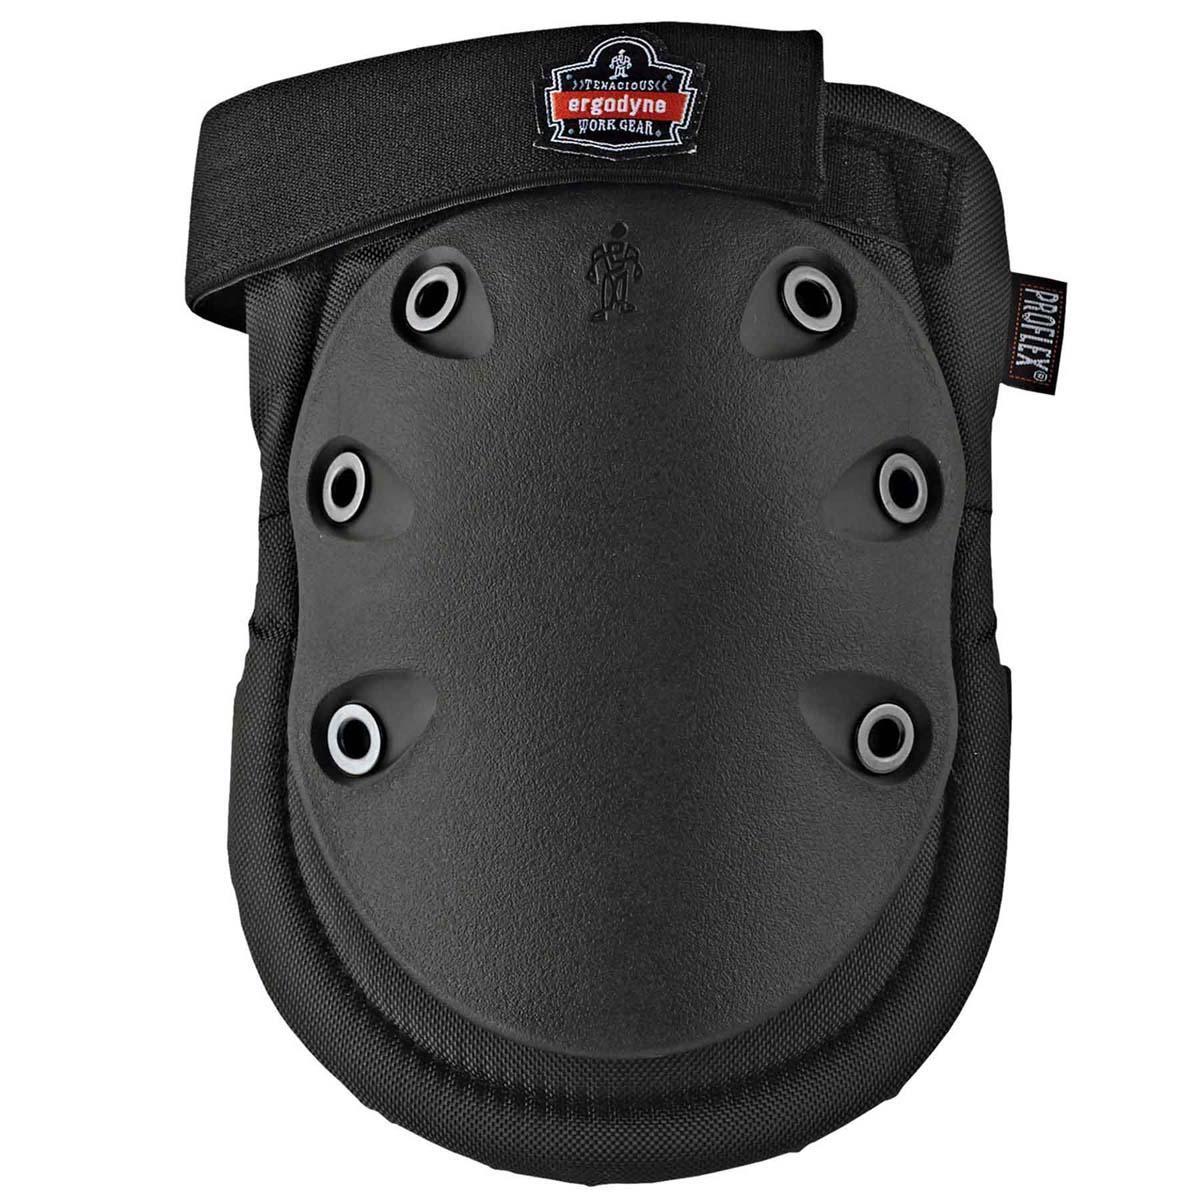 335HL  Black Cap Slip Resistant Rubber Cap Knee Pad - H&L